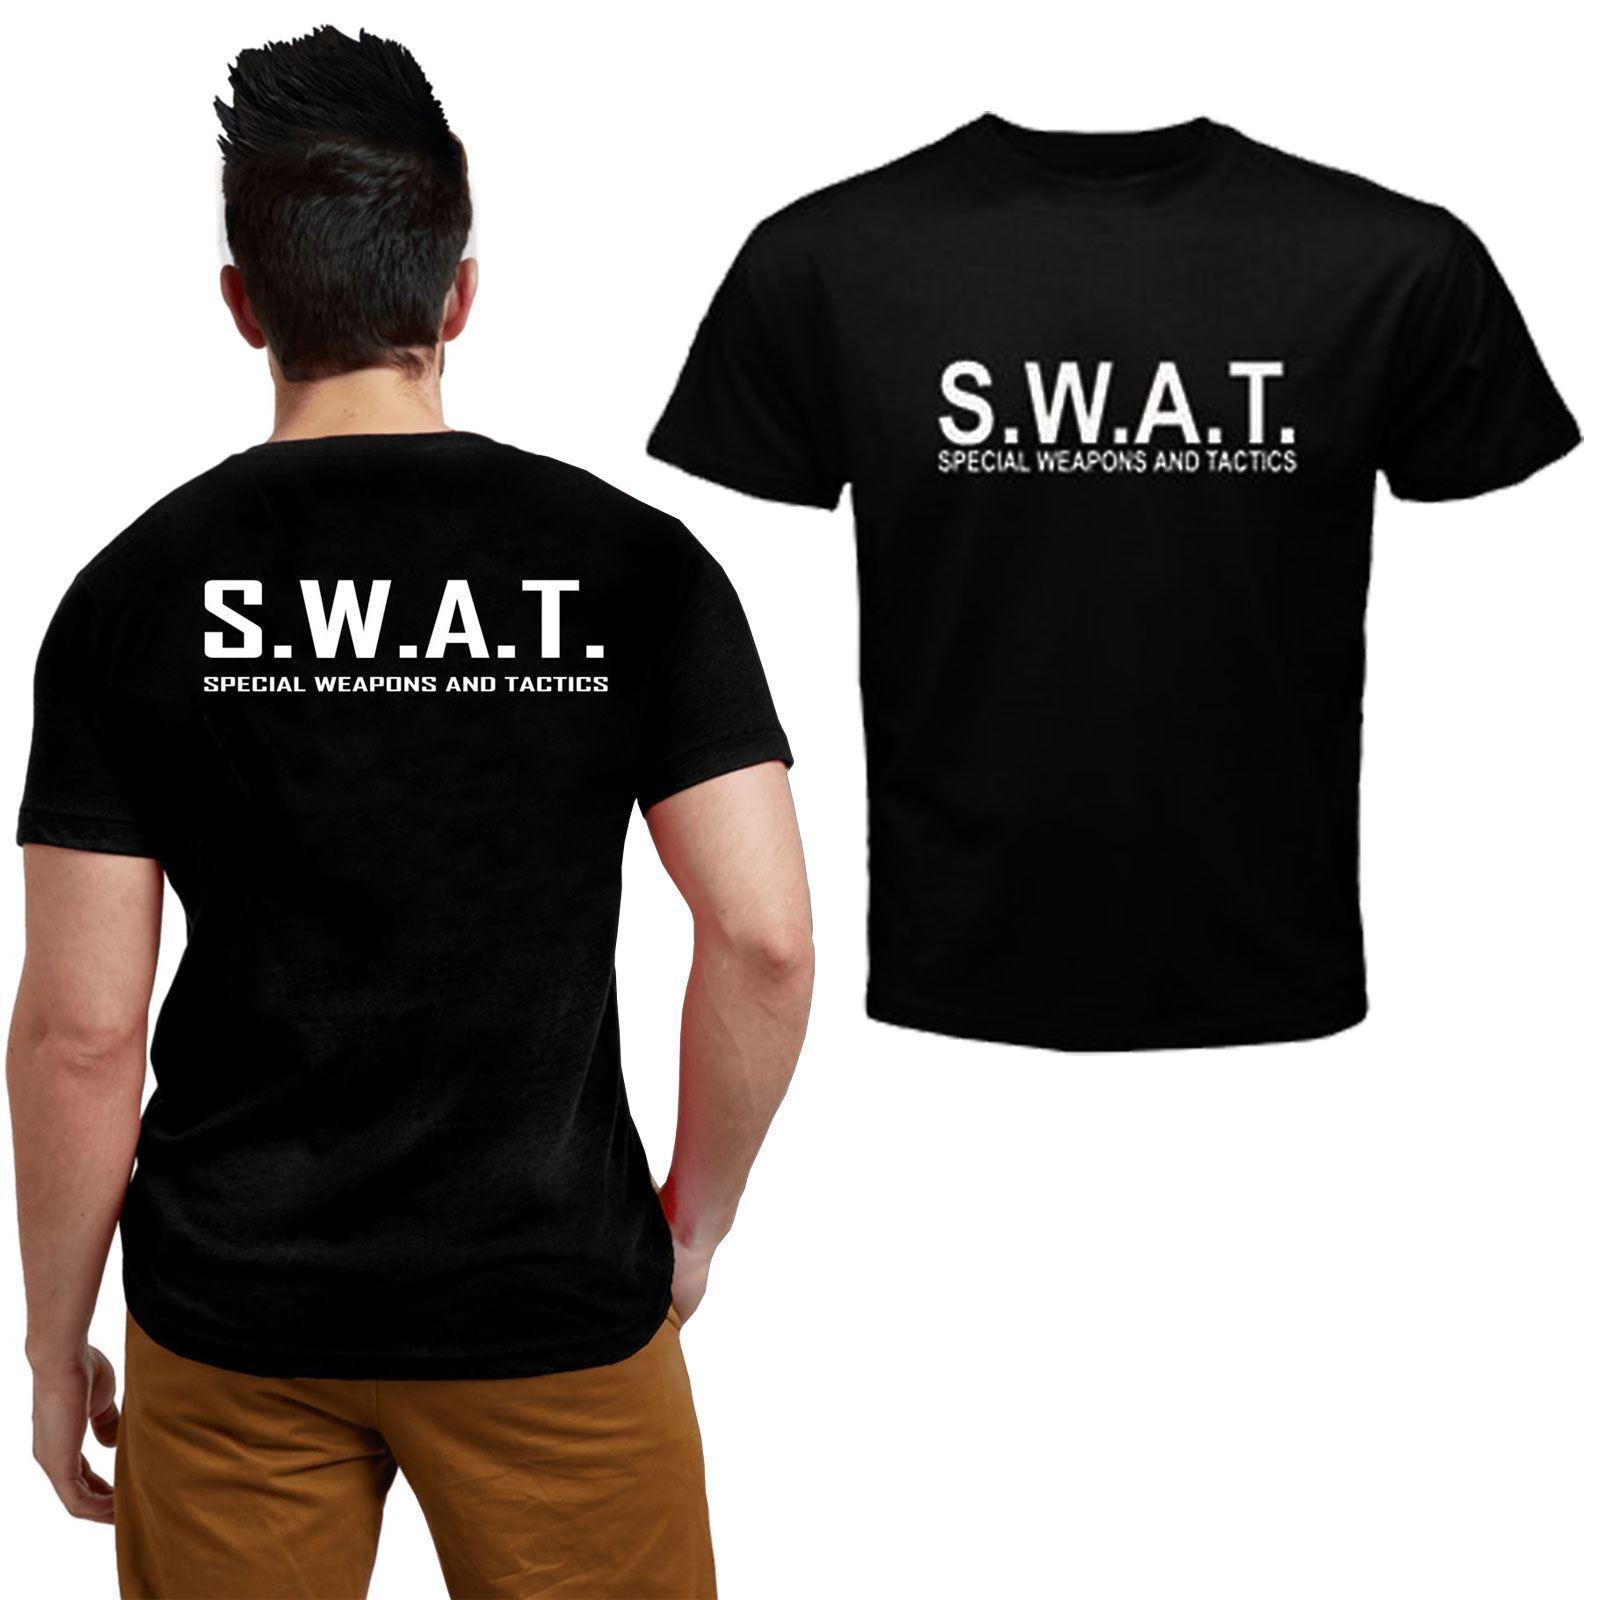 MENS BOYS SWAT T-SHIRTS POLICE MILITARY COPS WEAPONS /& TACTICS COMBAT TOPS S-XXL